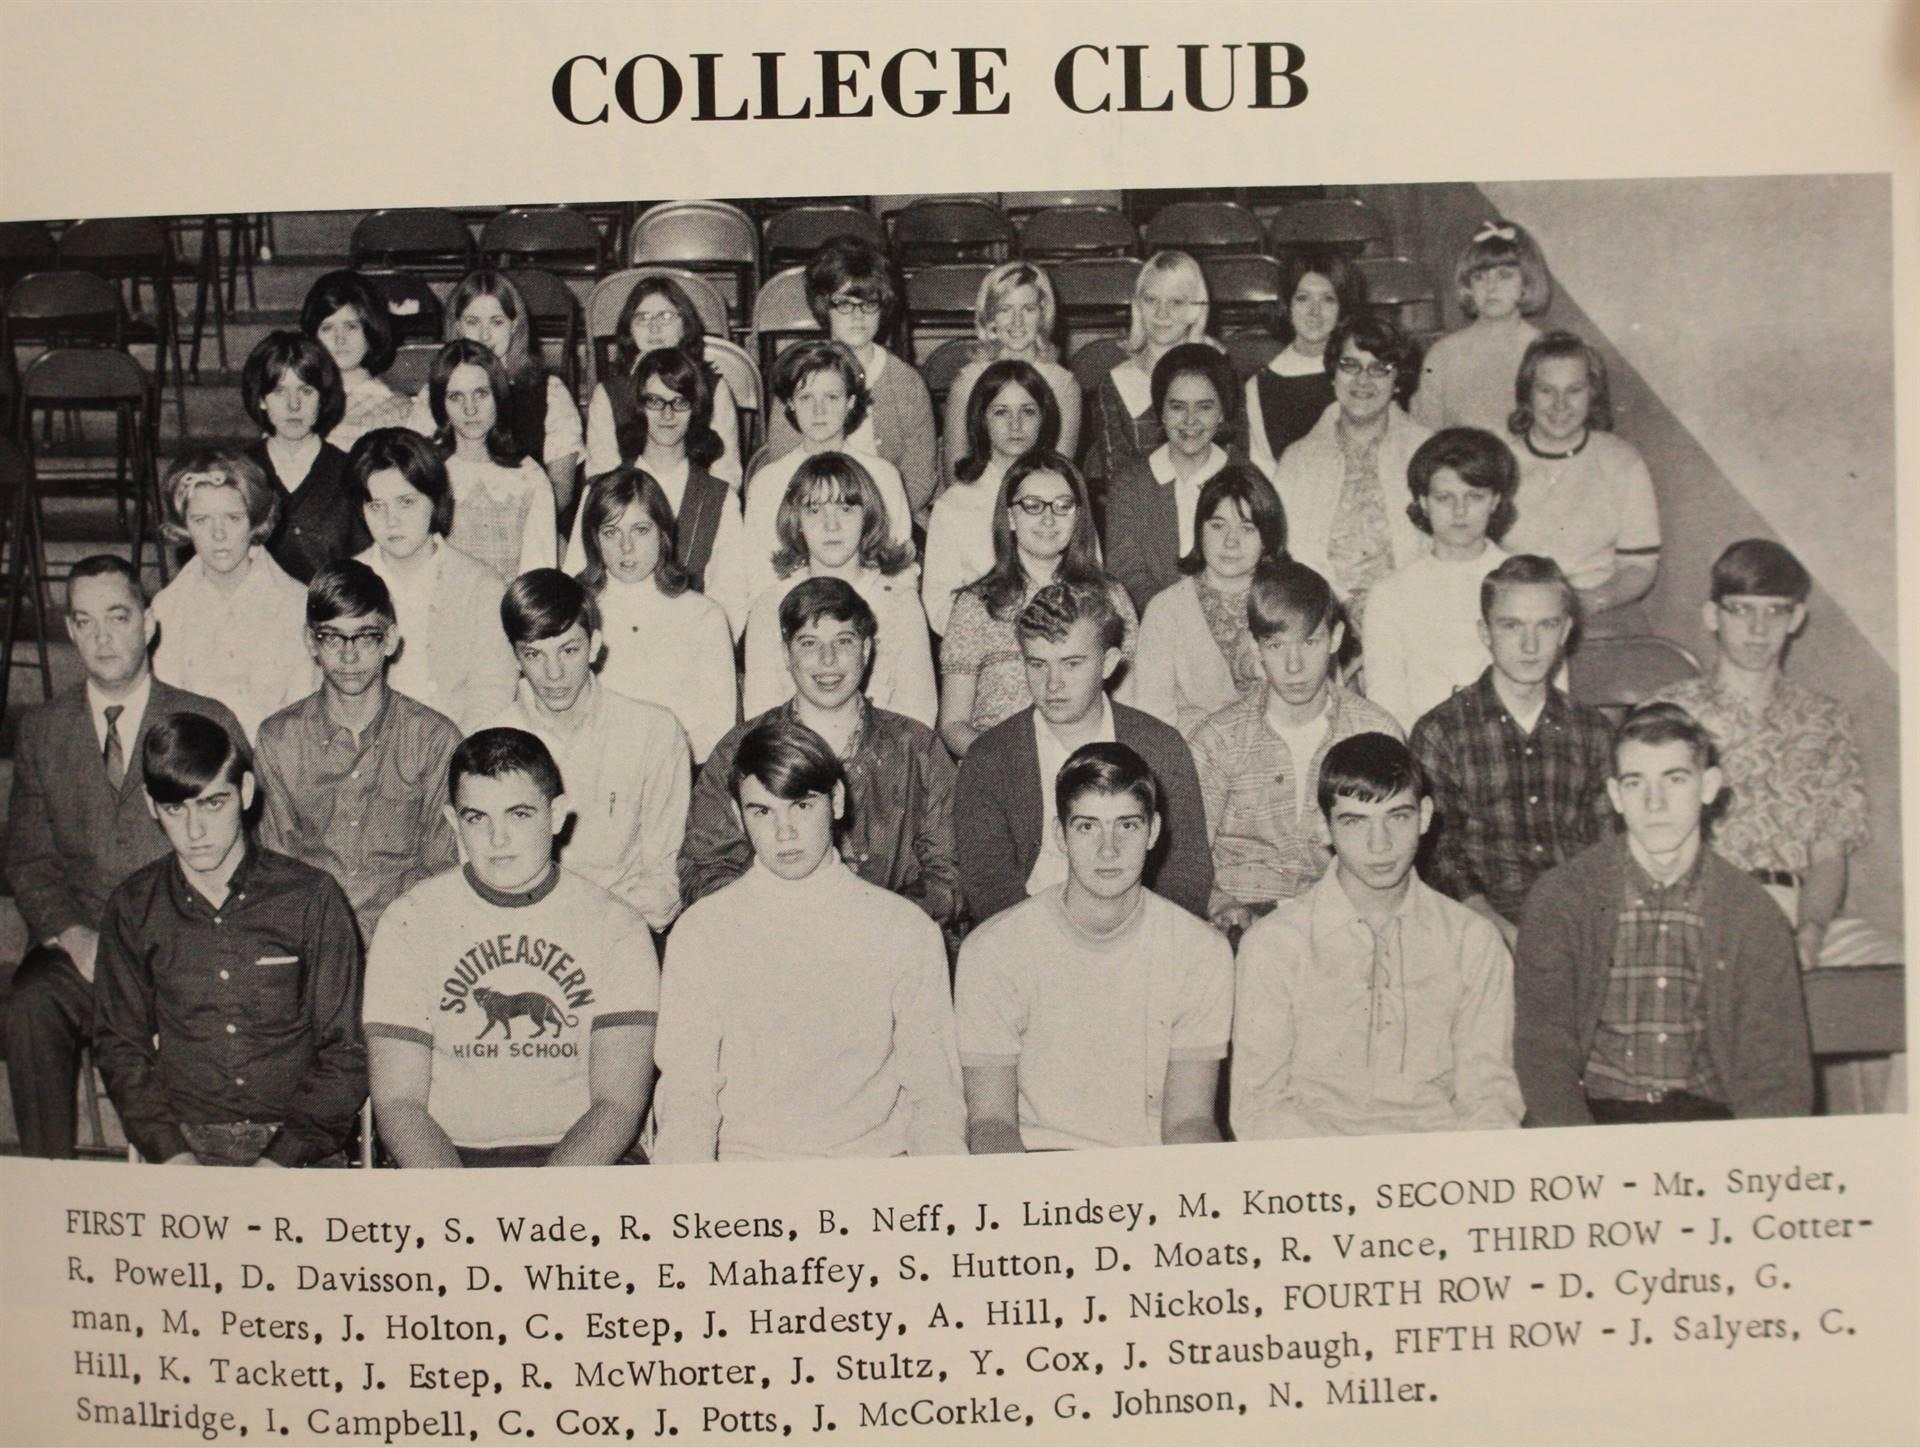 1969 College Club